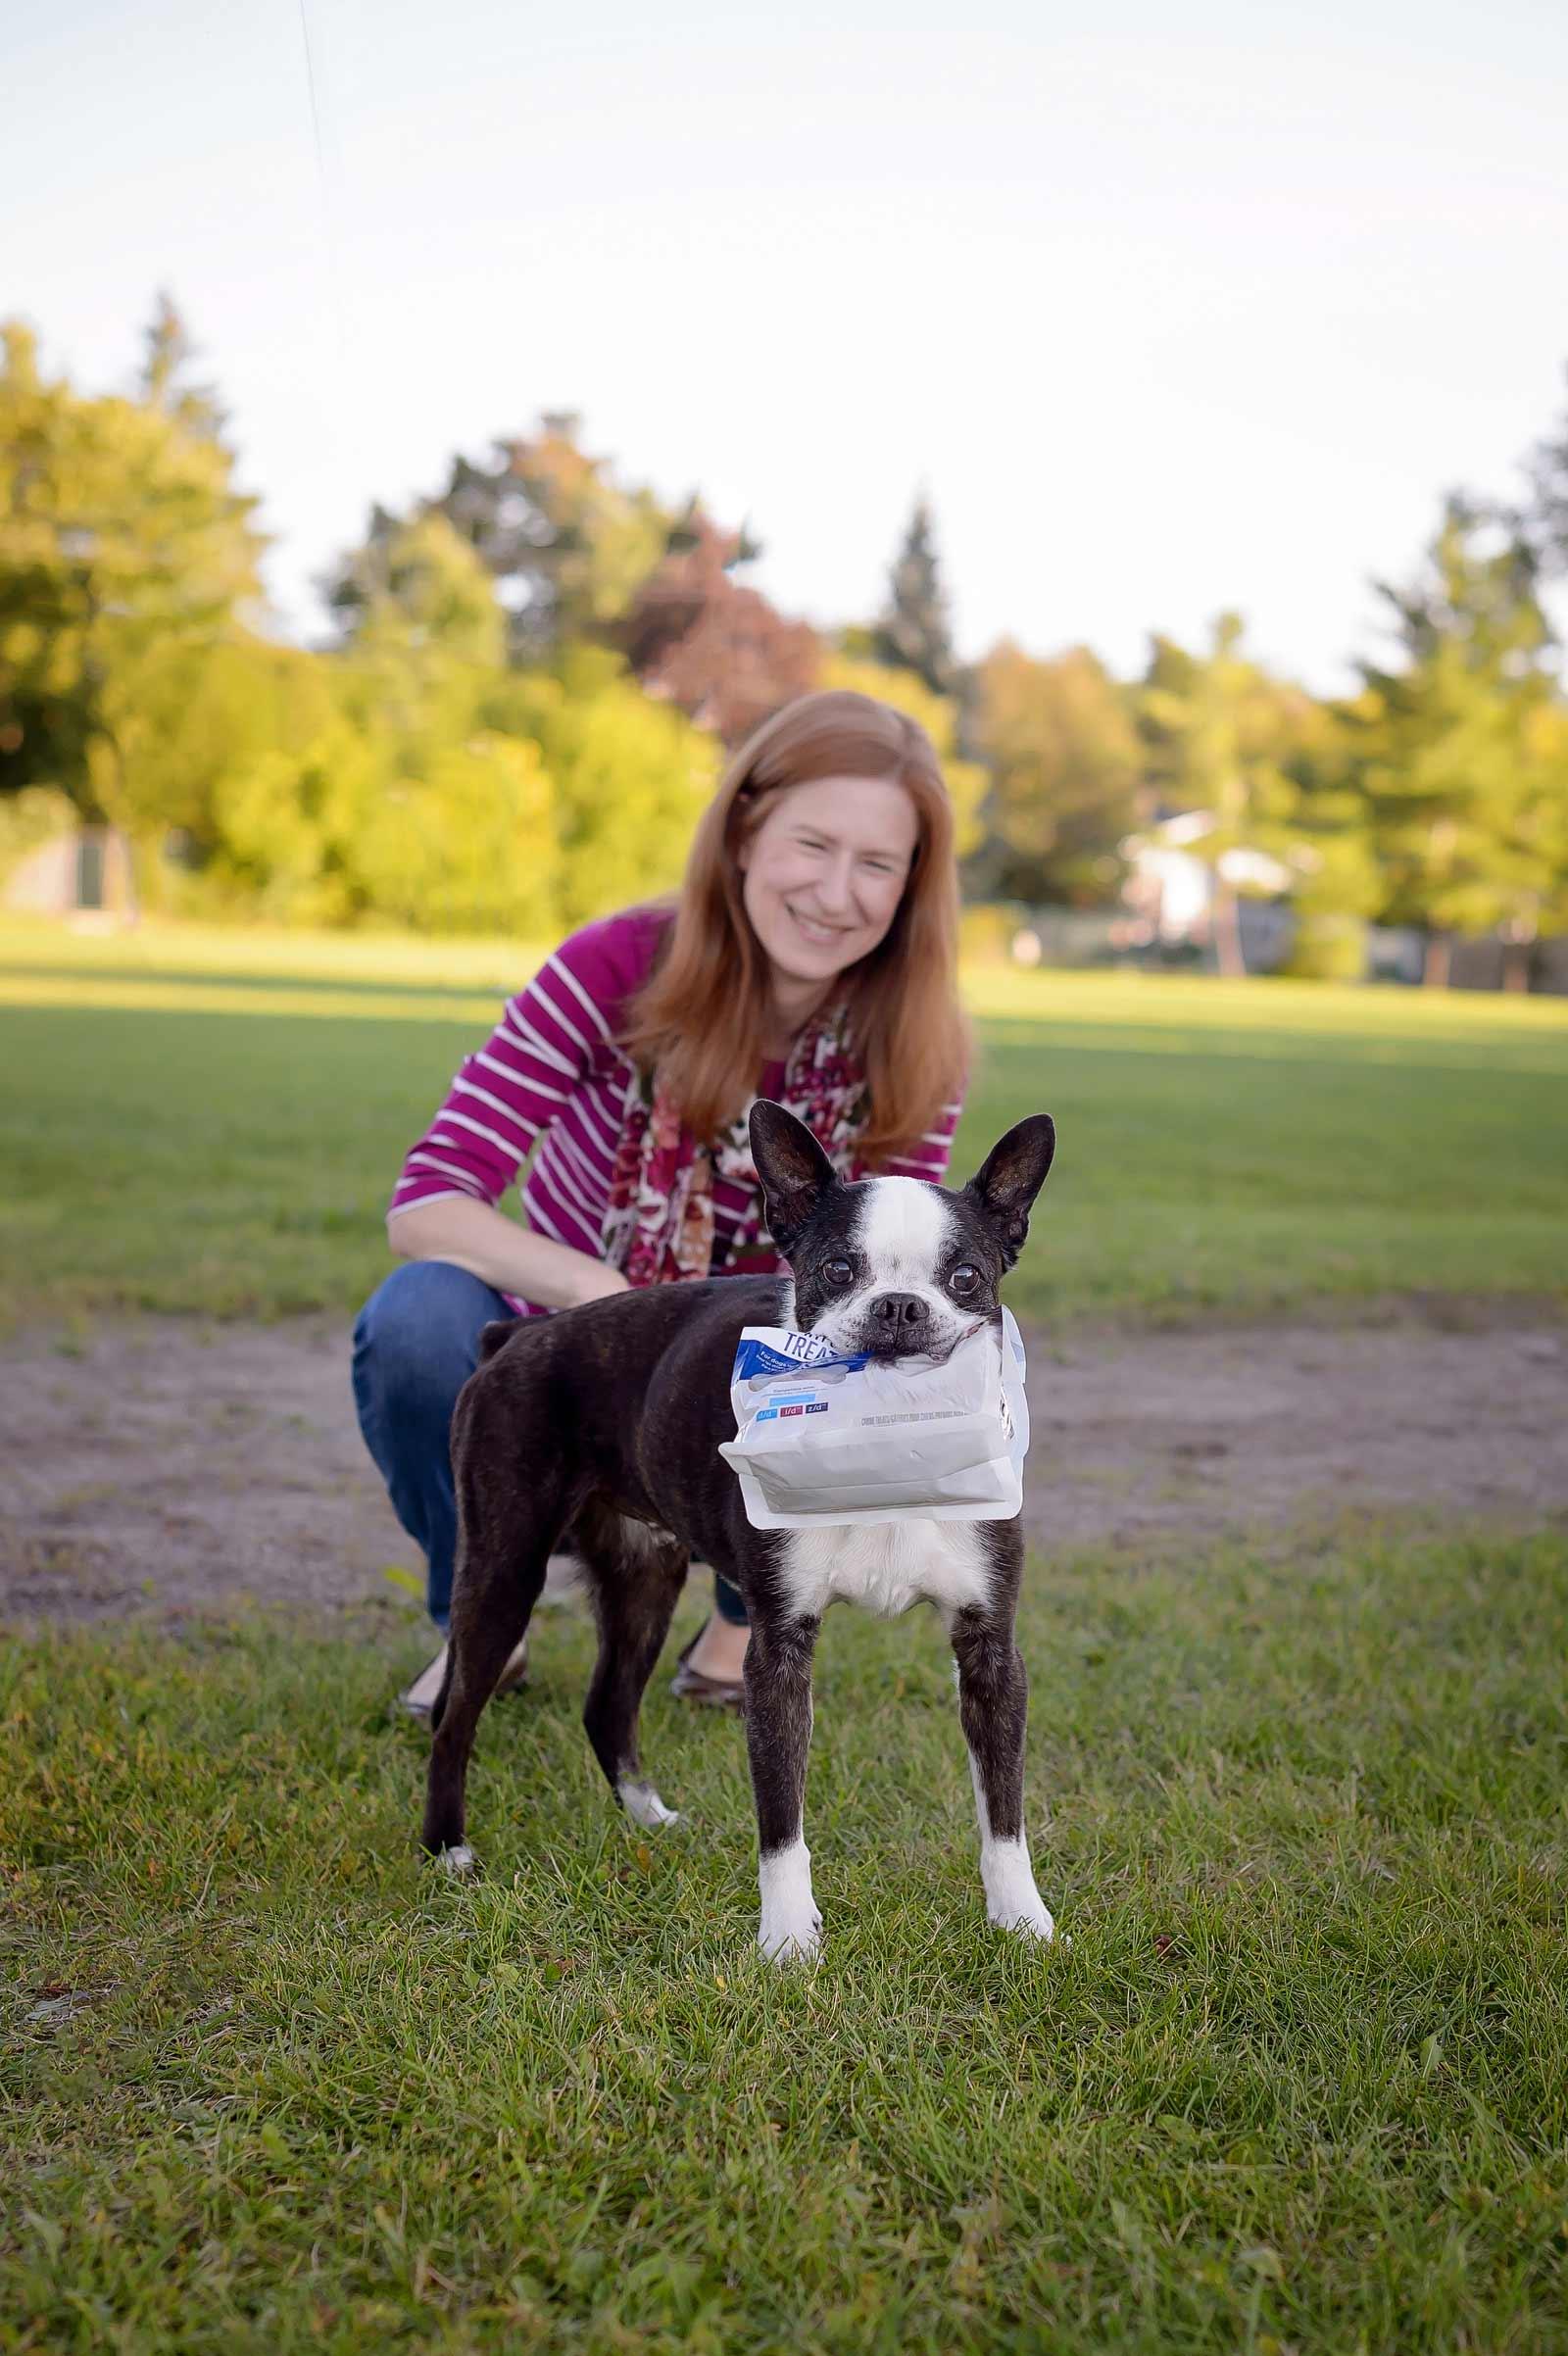 Henry-Chloe-boston-terriers-sneakpeek-01